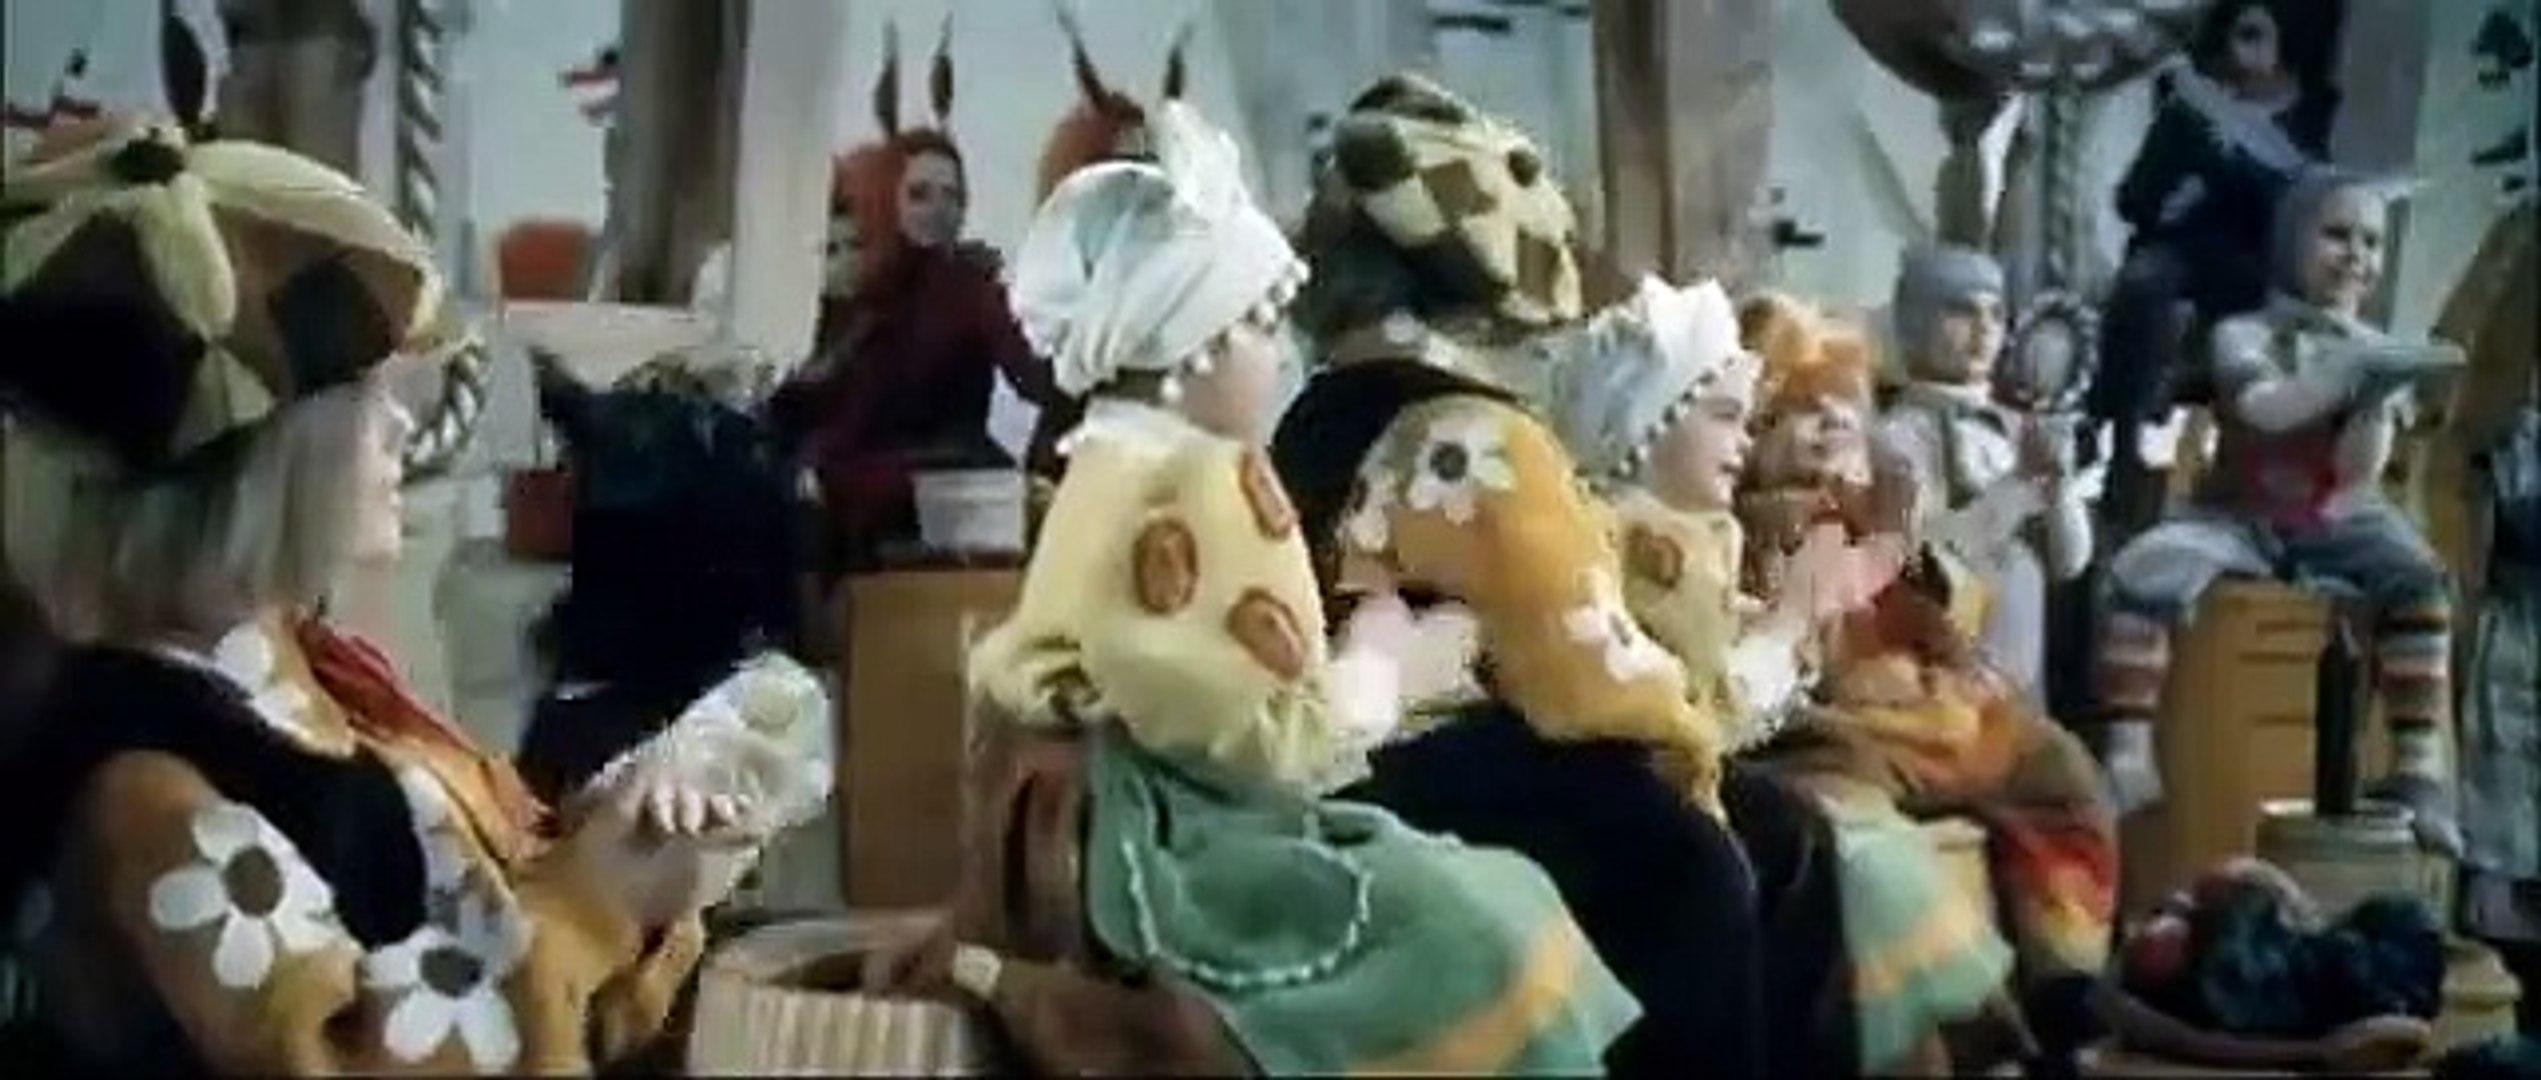 Мама (музыкальный фильм, реж Элизабет Бостан, 1976 г.)